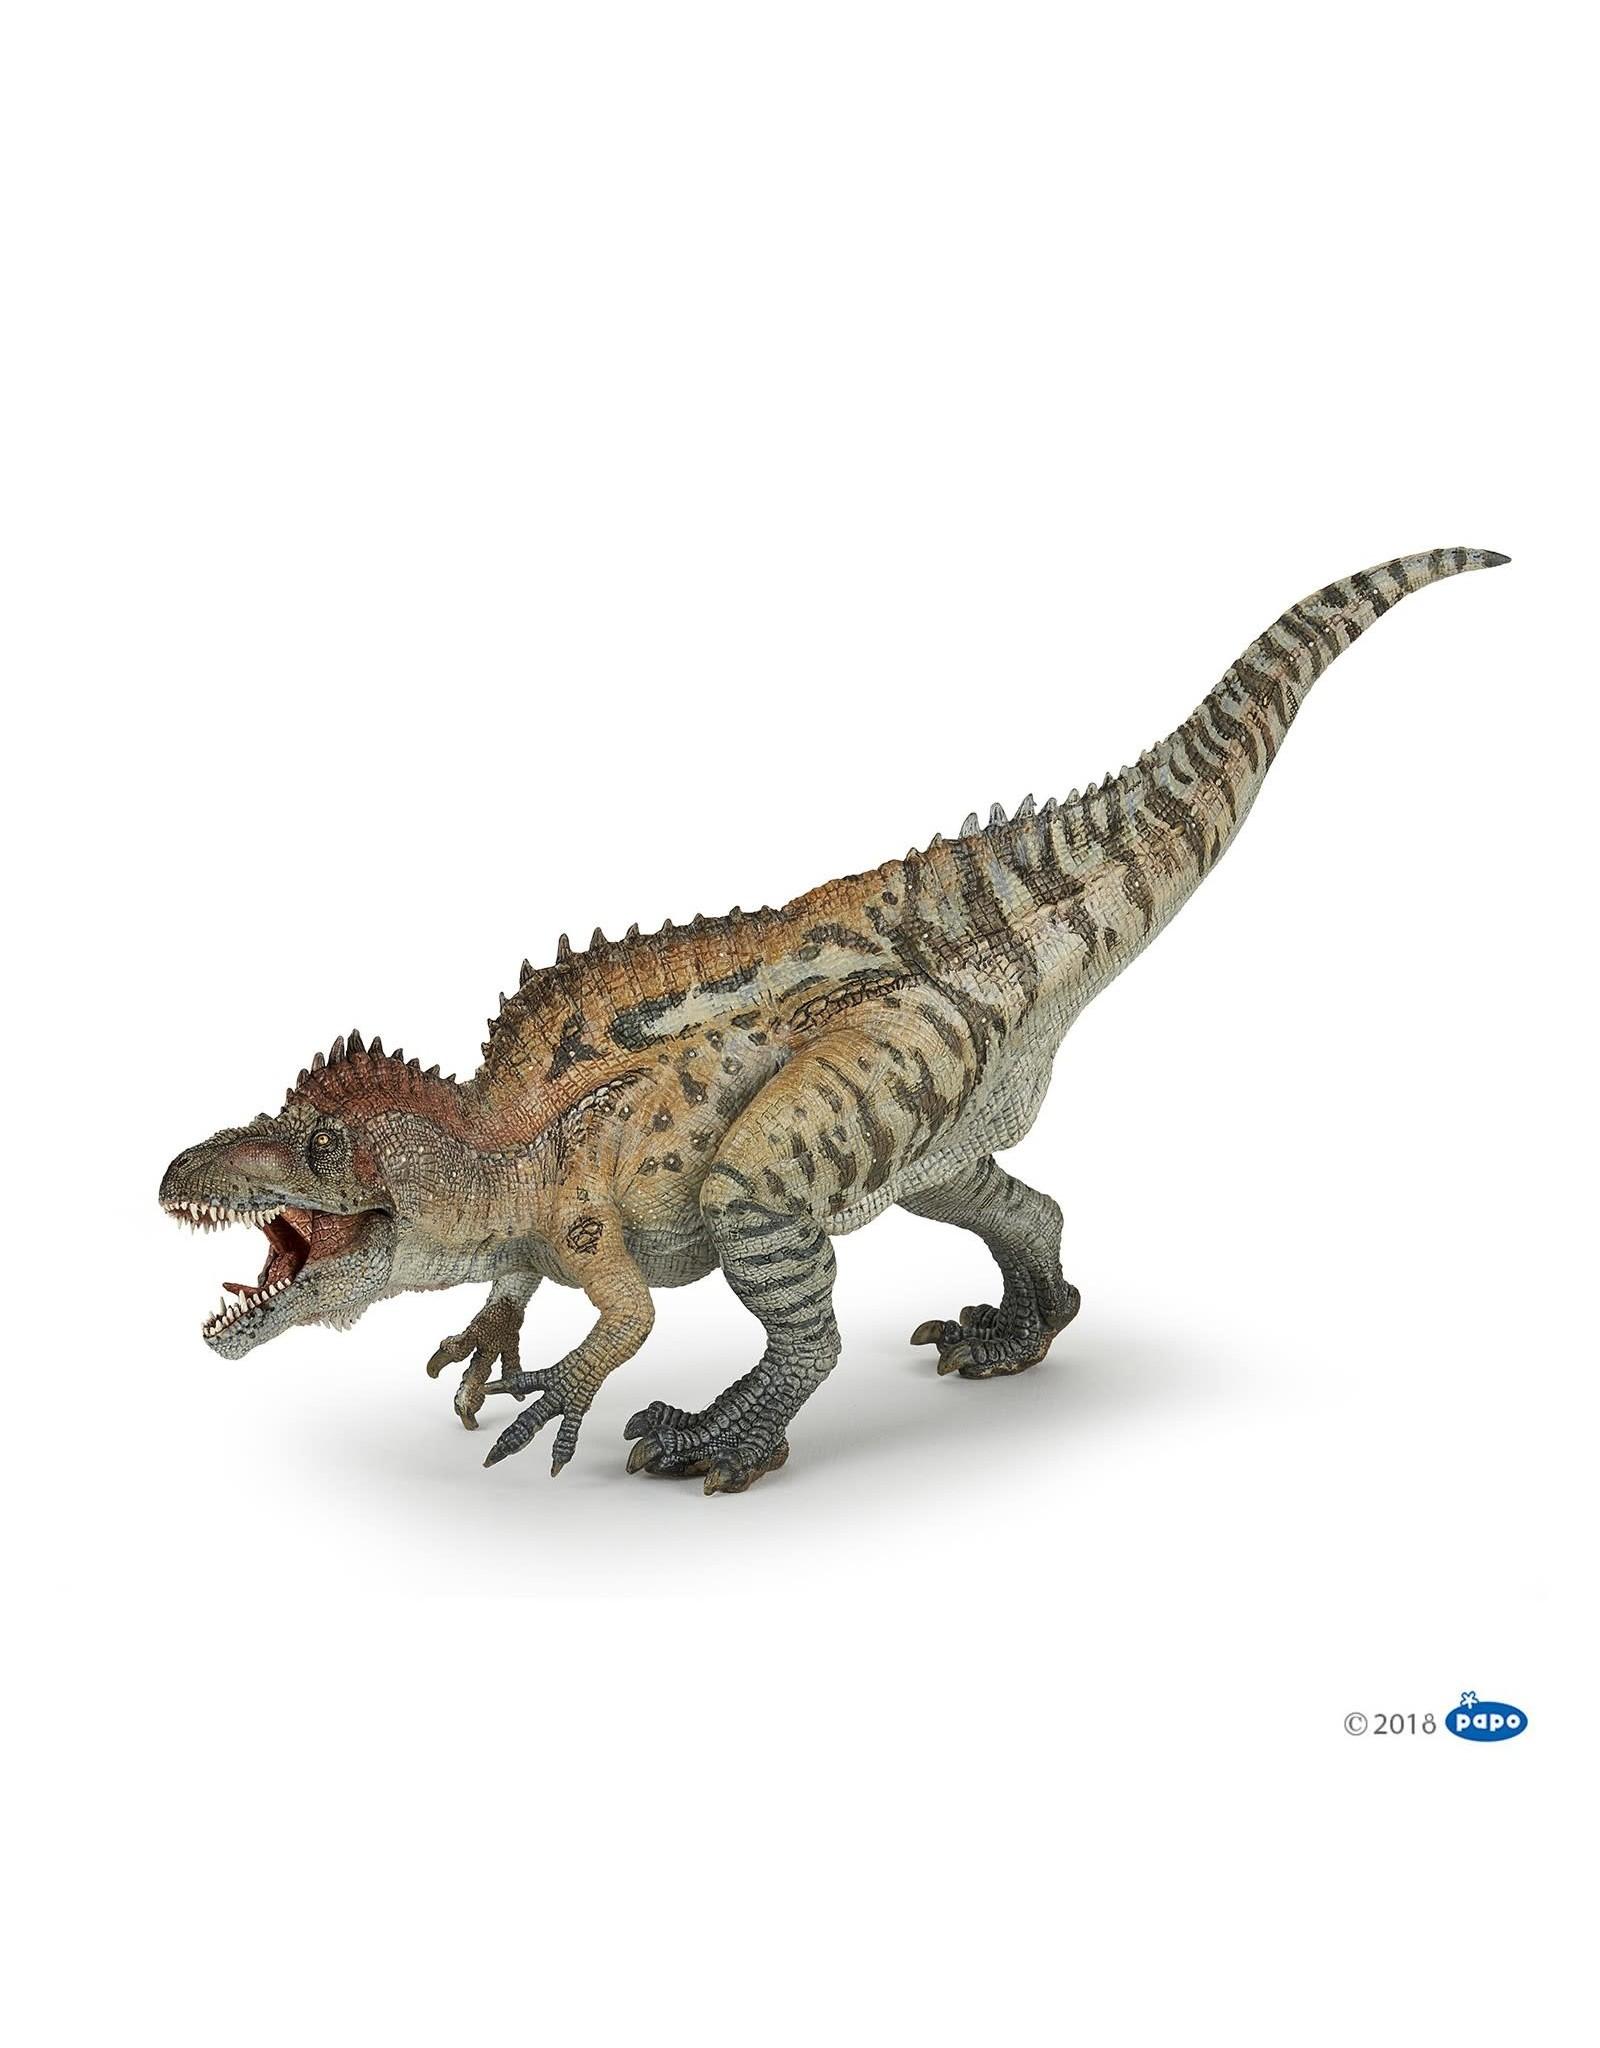 Papo Acrocanthosaurus - Papo Dinosaurs